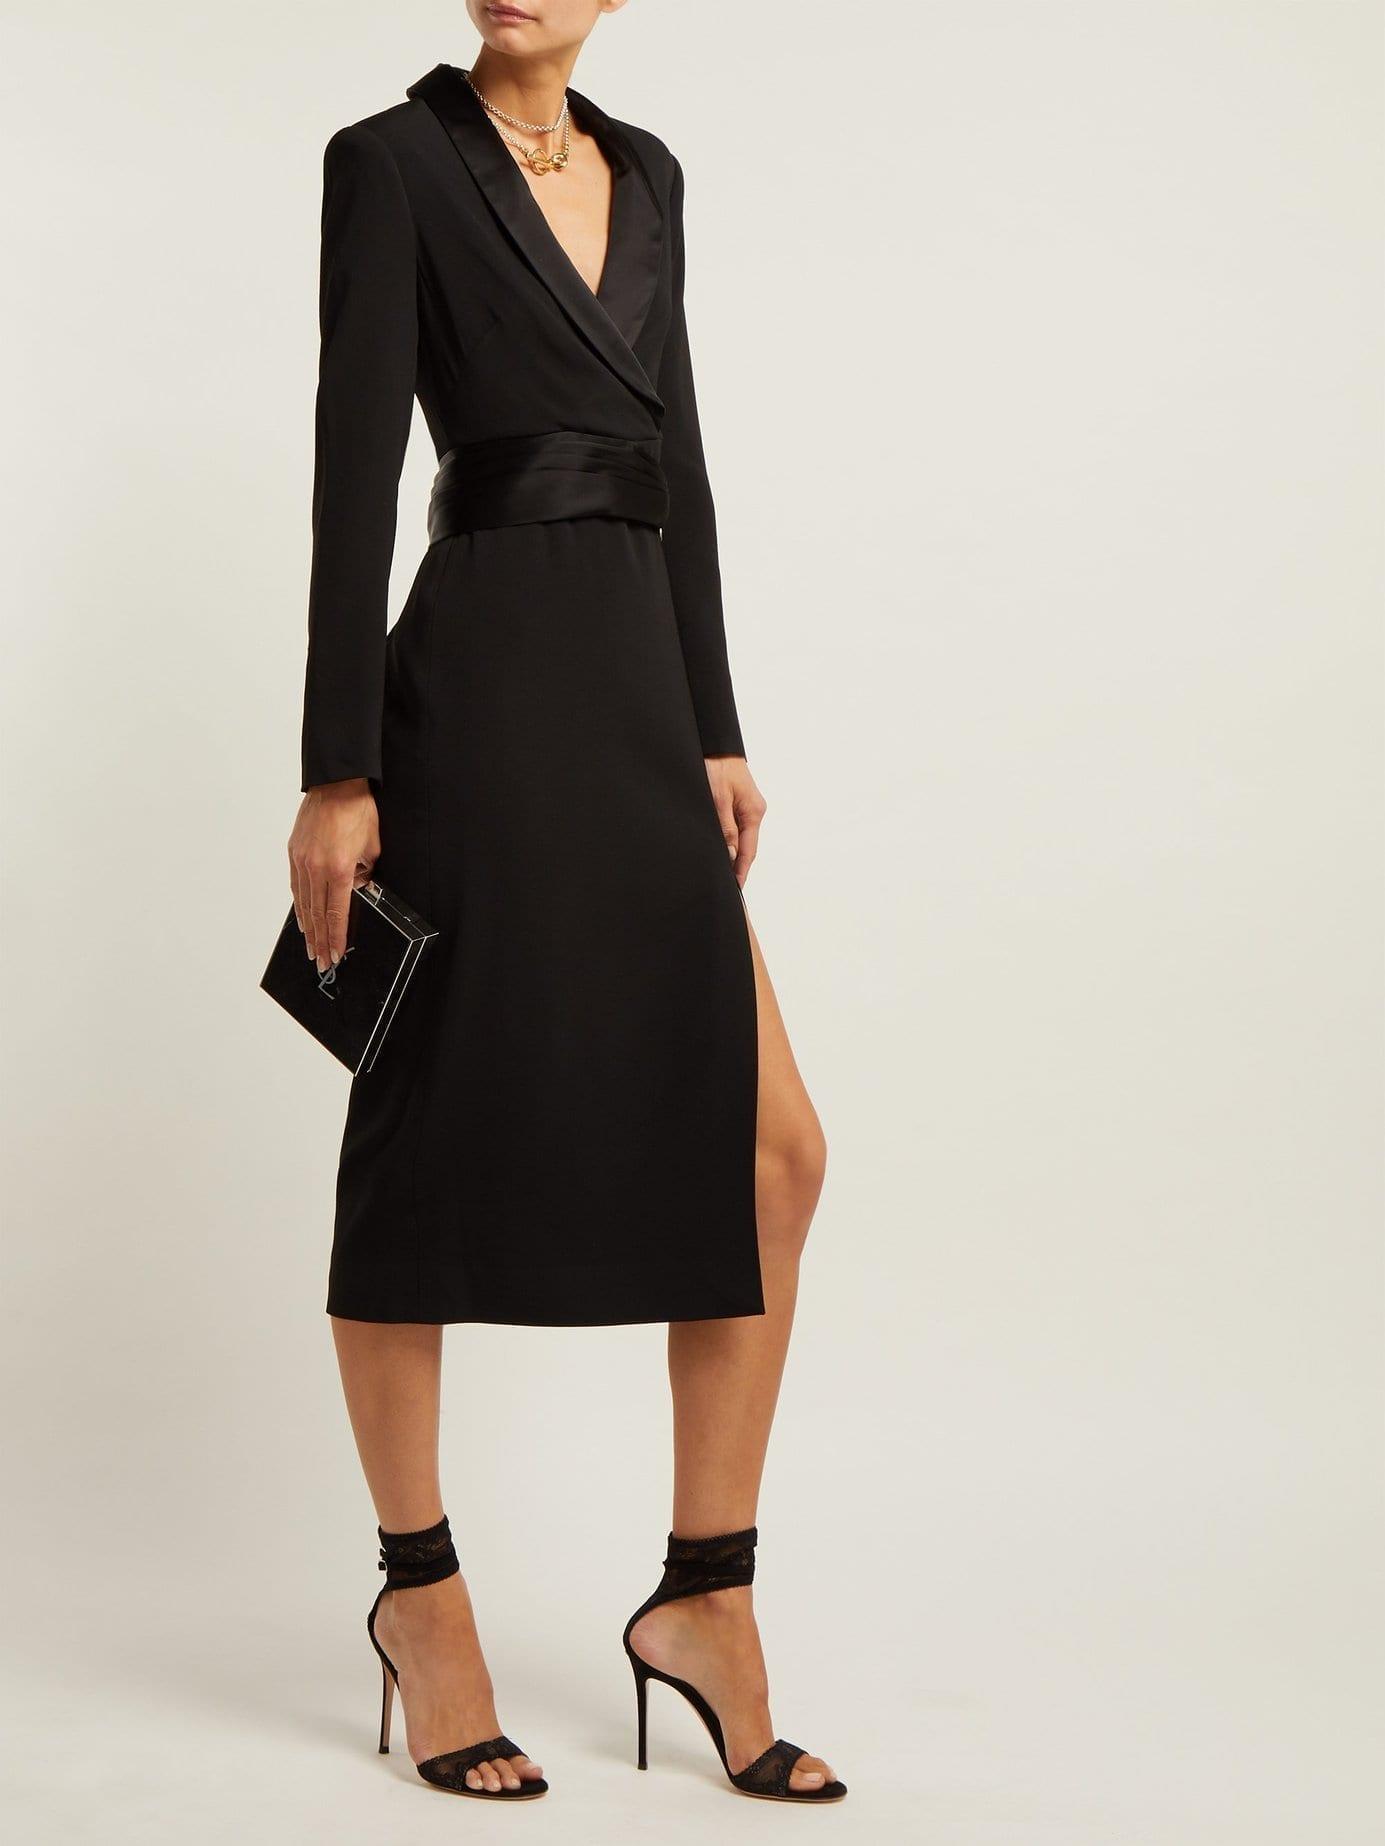 JONATHAN SIMKHAI Tuxedo-style Crepe Black Dress